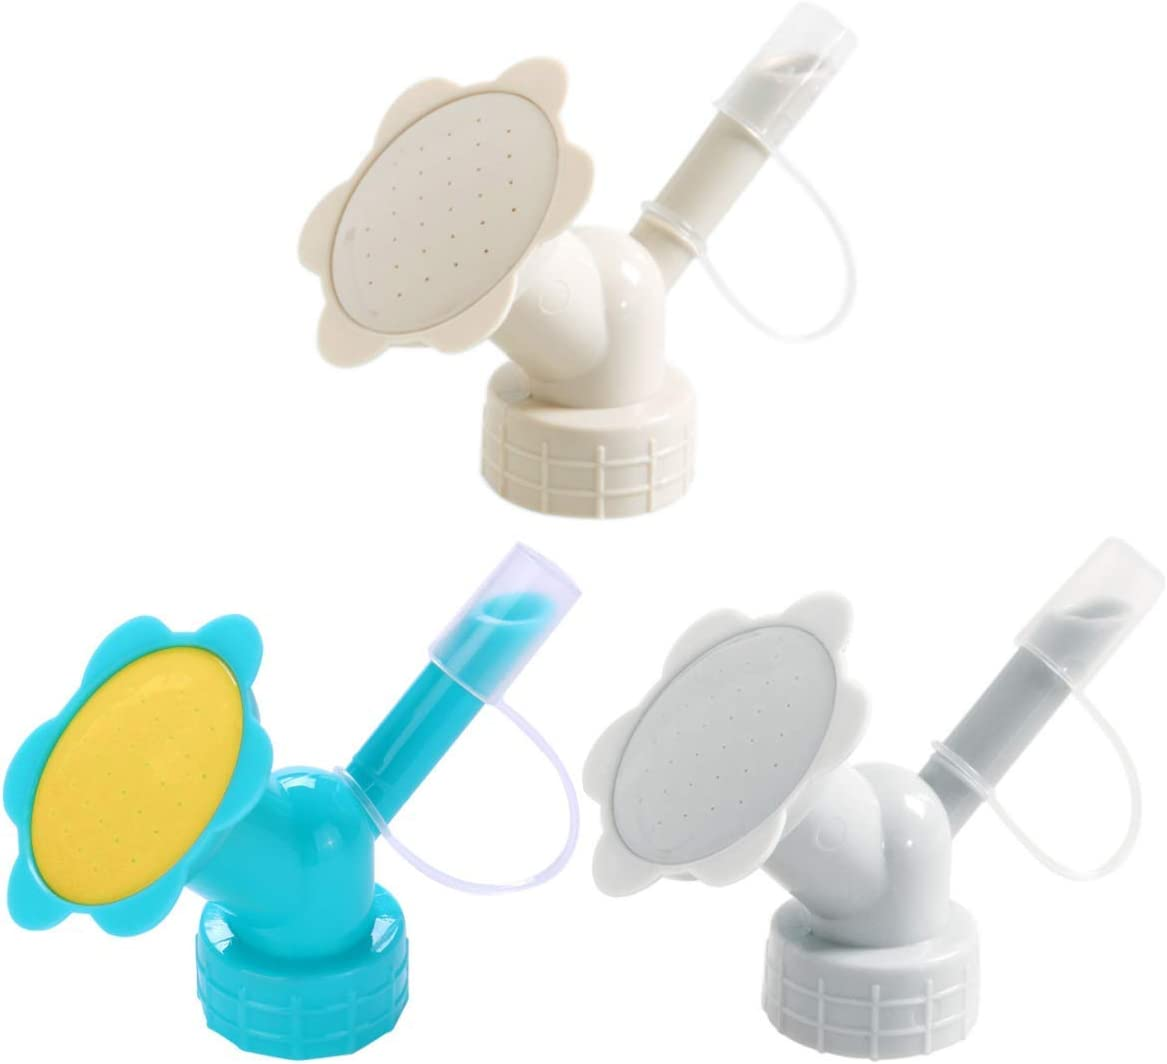 LuFOX 3Pcs Plastic Dual Head Bottle Cap Sprinkler, Bottle Watering Spout Bonsai Watering Can for Indoor Seedlings Plant, Garden Tool